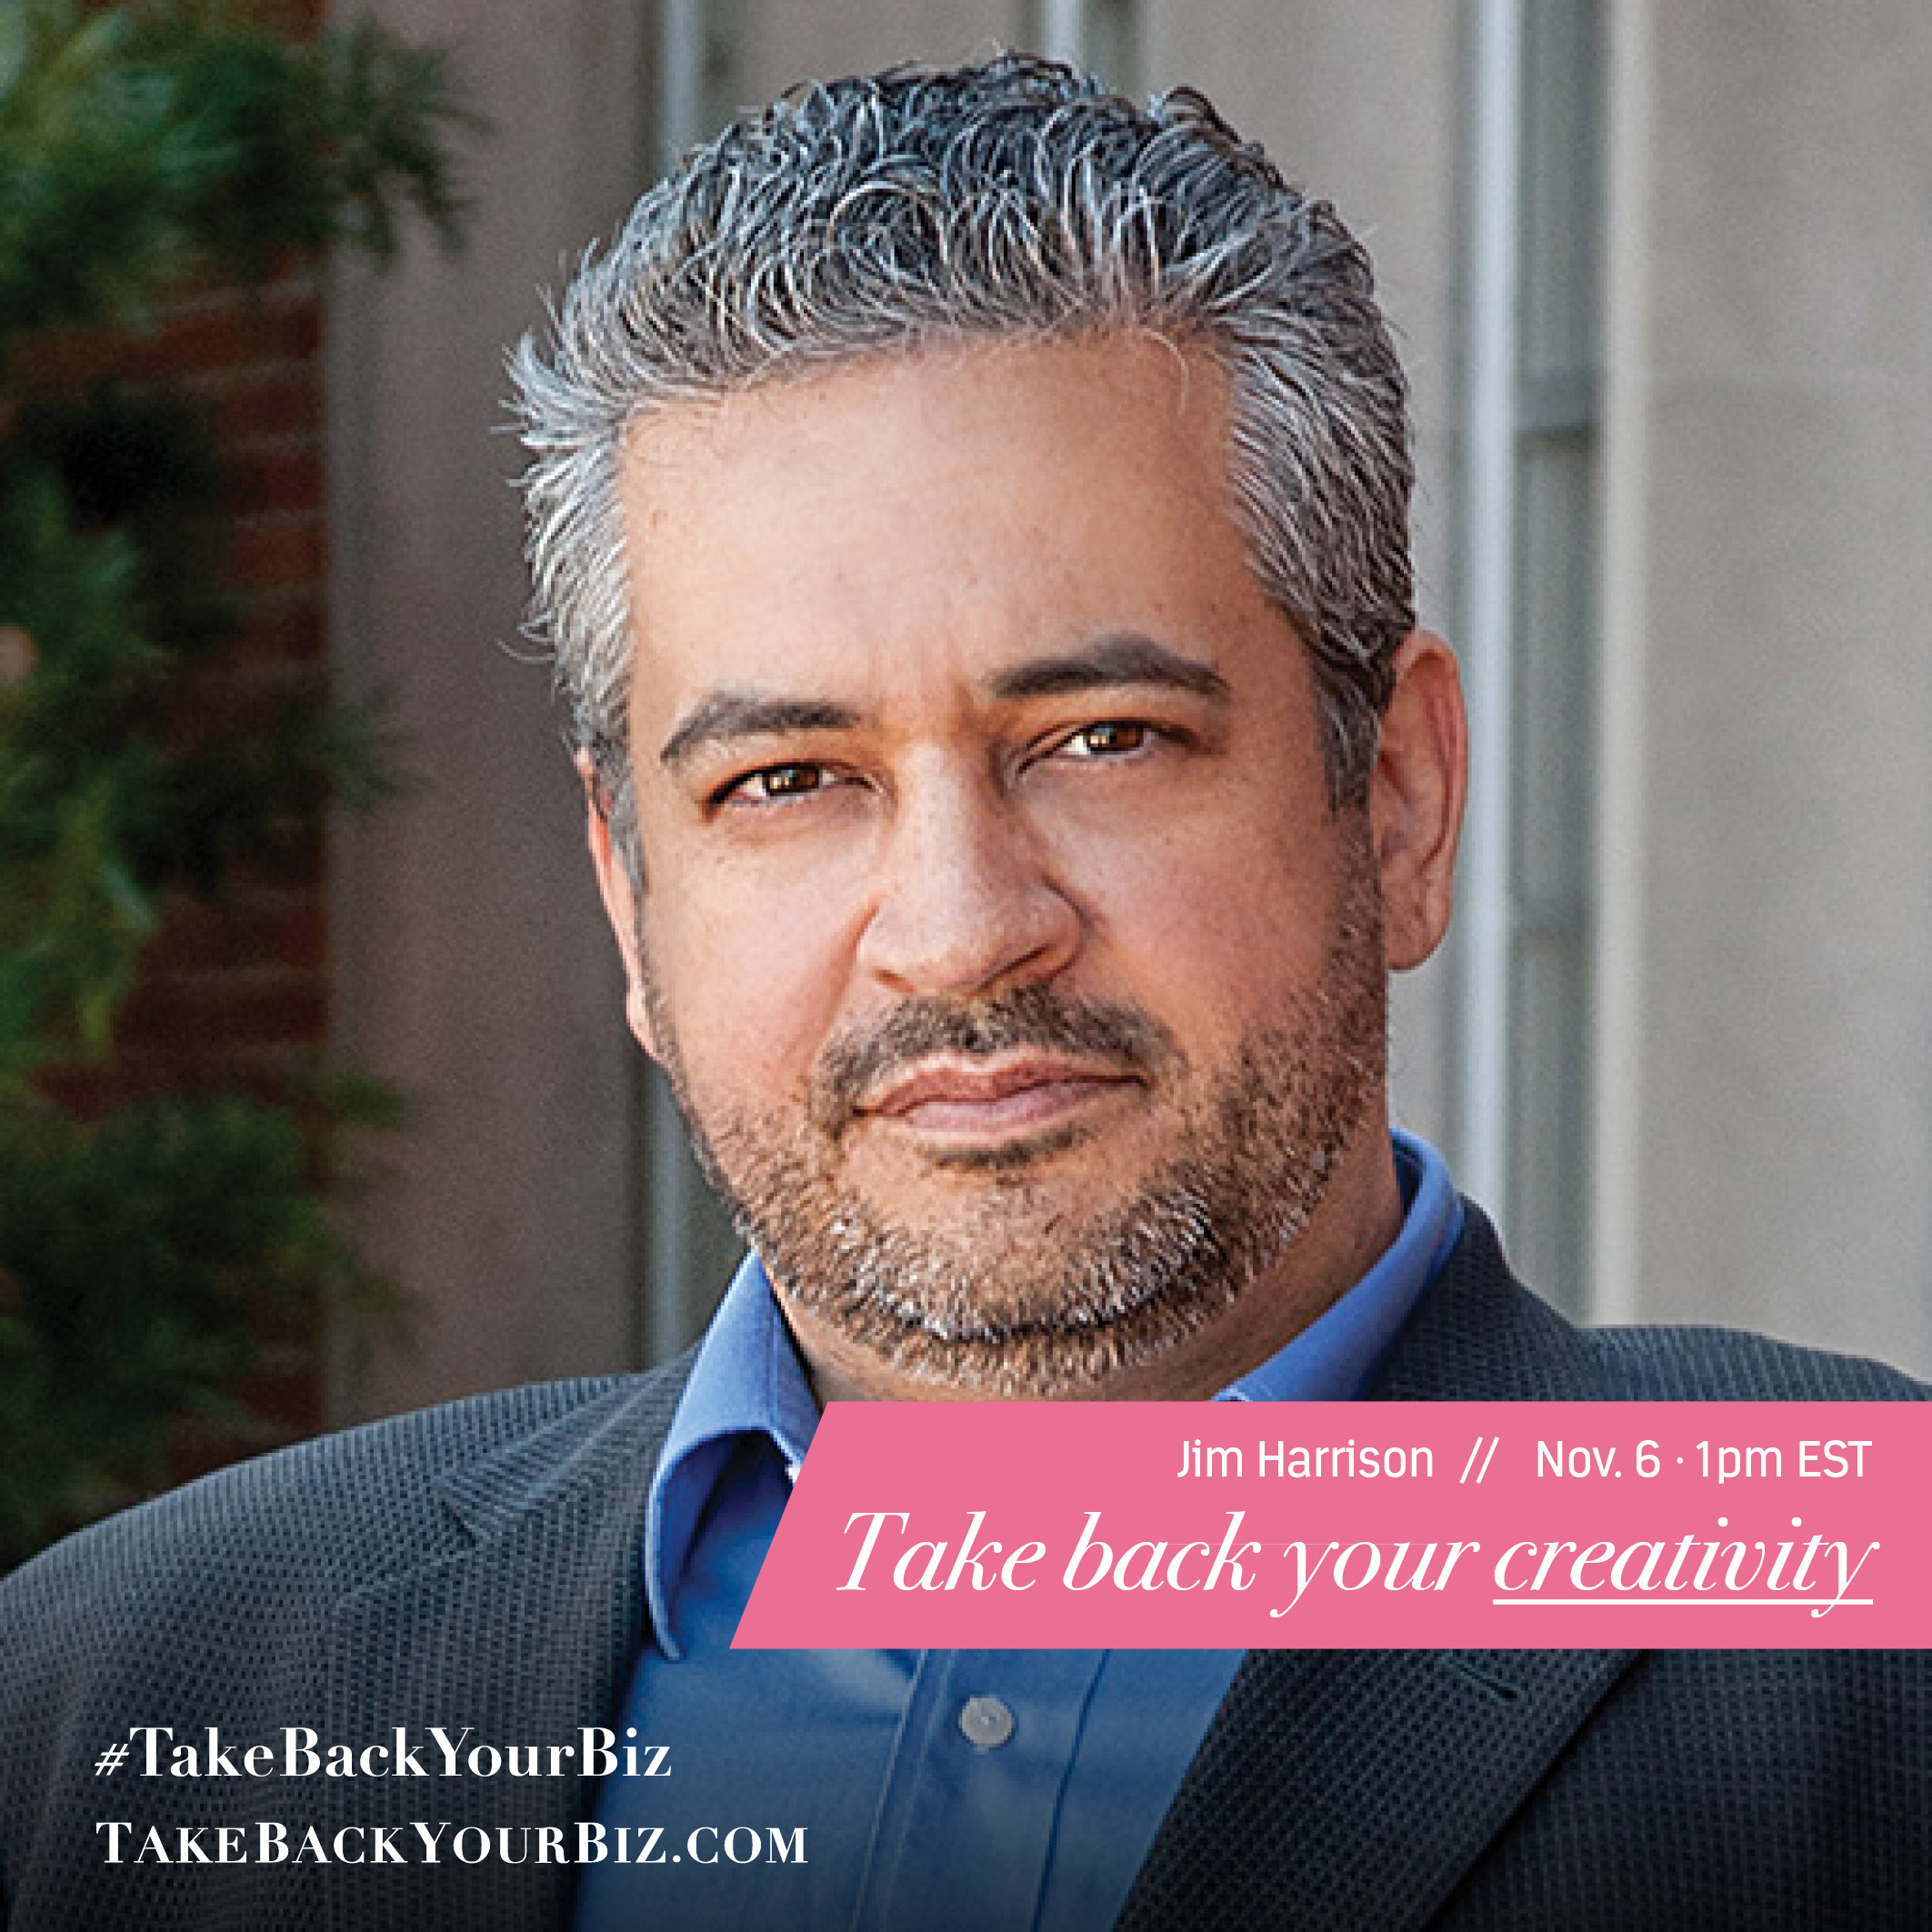 Take-Back-Your-Biz-Speakers-Jim-Harrison